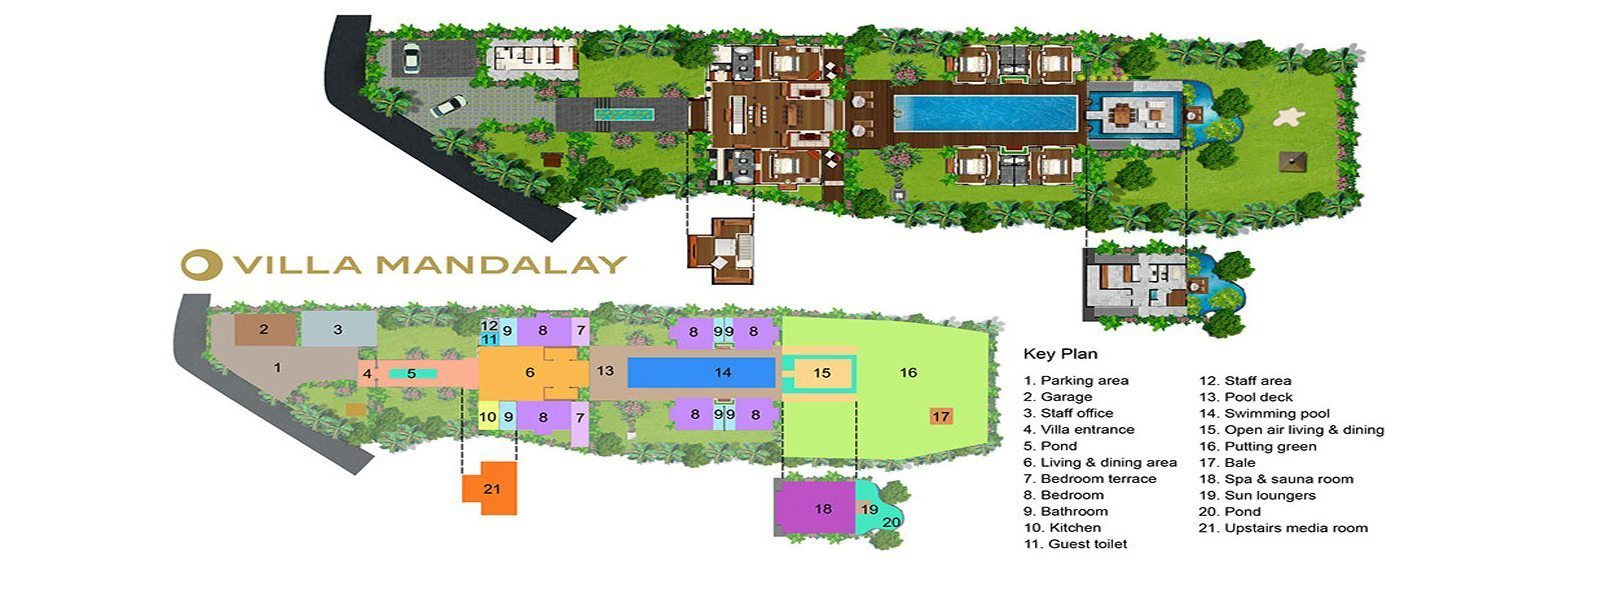 Villa Mandalay Hill Floorplan | Seseh, Bali